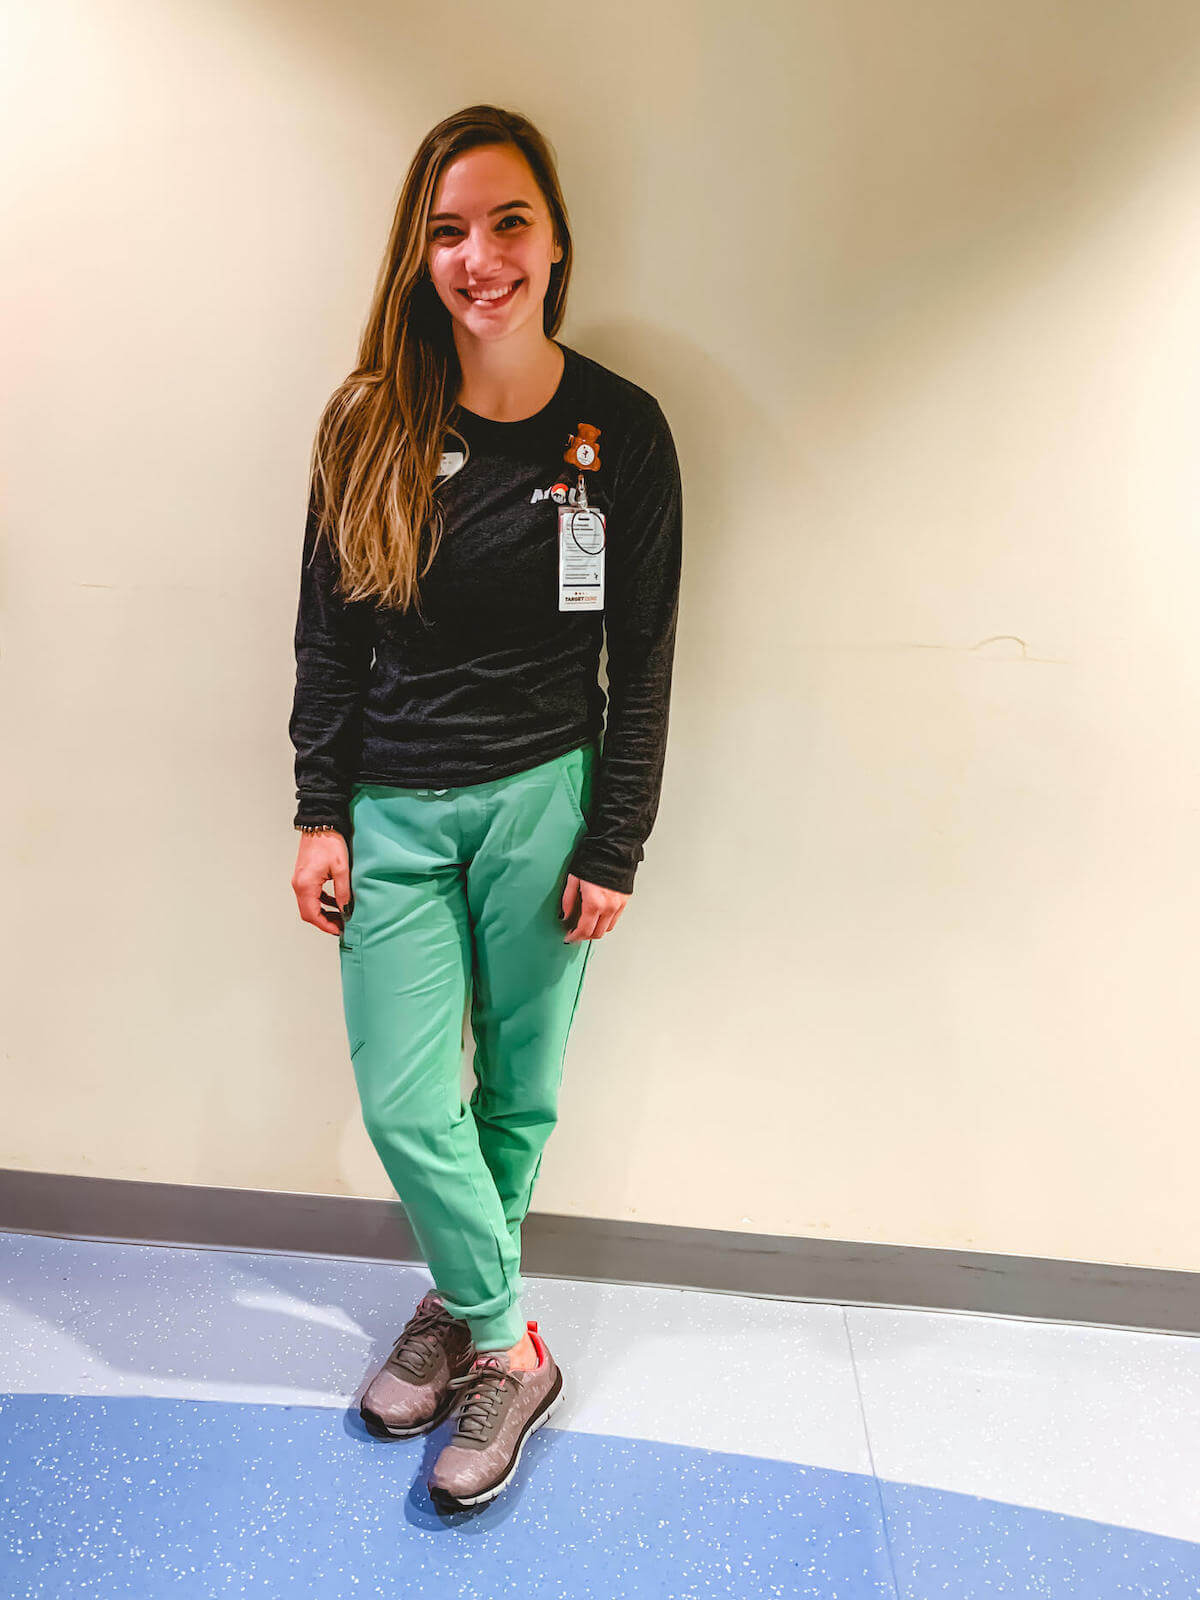 nurse ashley rn posing against wall showing off new skechers nursing shoes for nurses